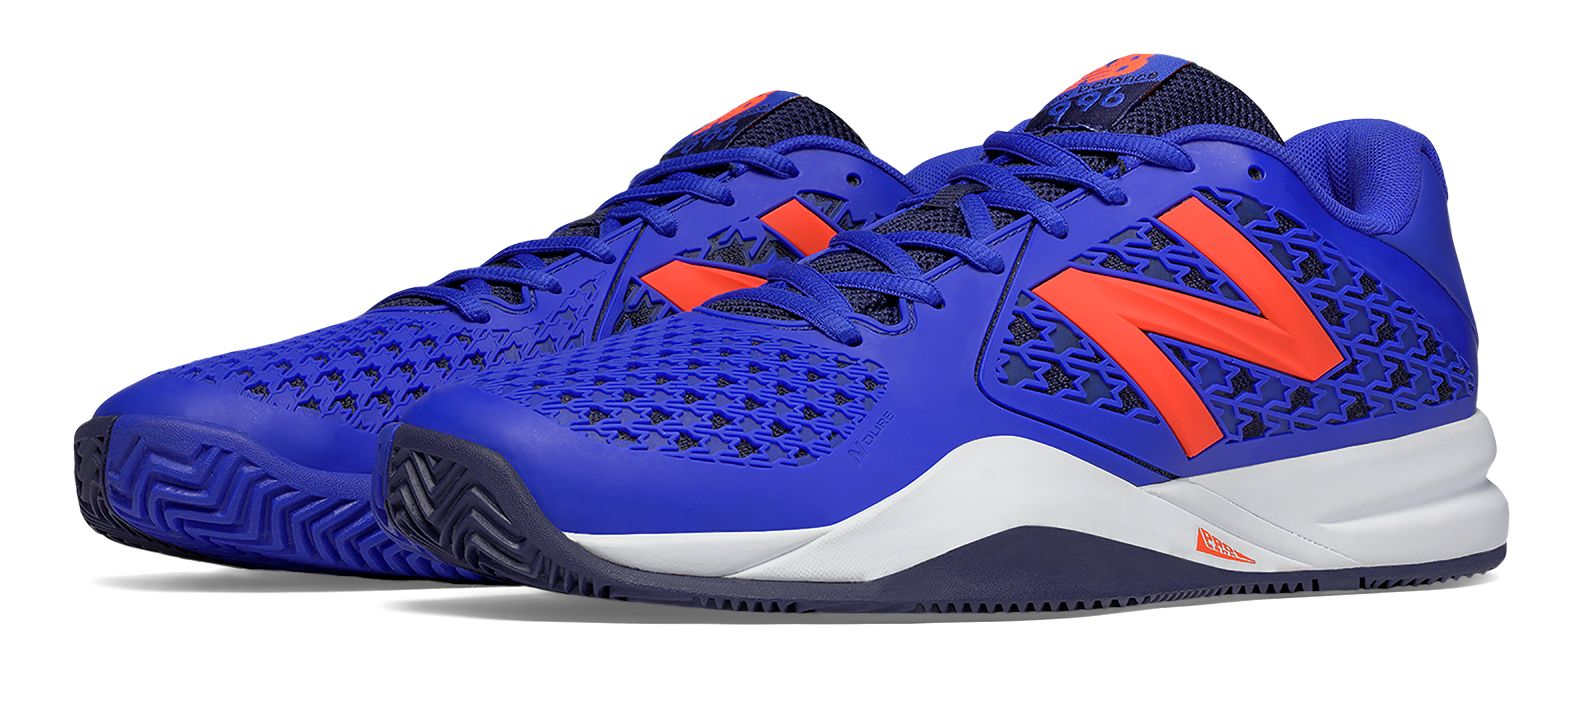 Fitness Mania – New Balance 996v2 Men s Tennis Shoes – MC996BO2 0fcbcc2261b9